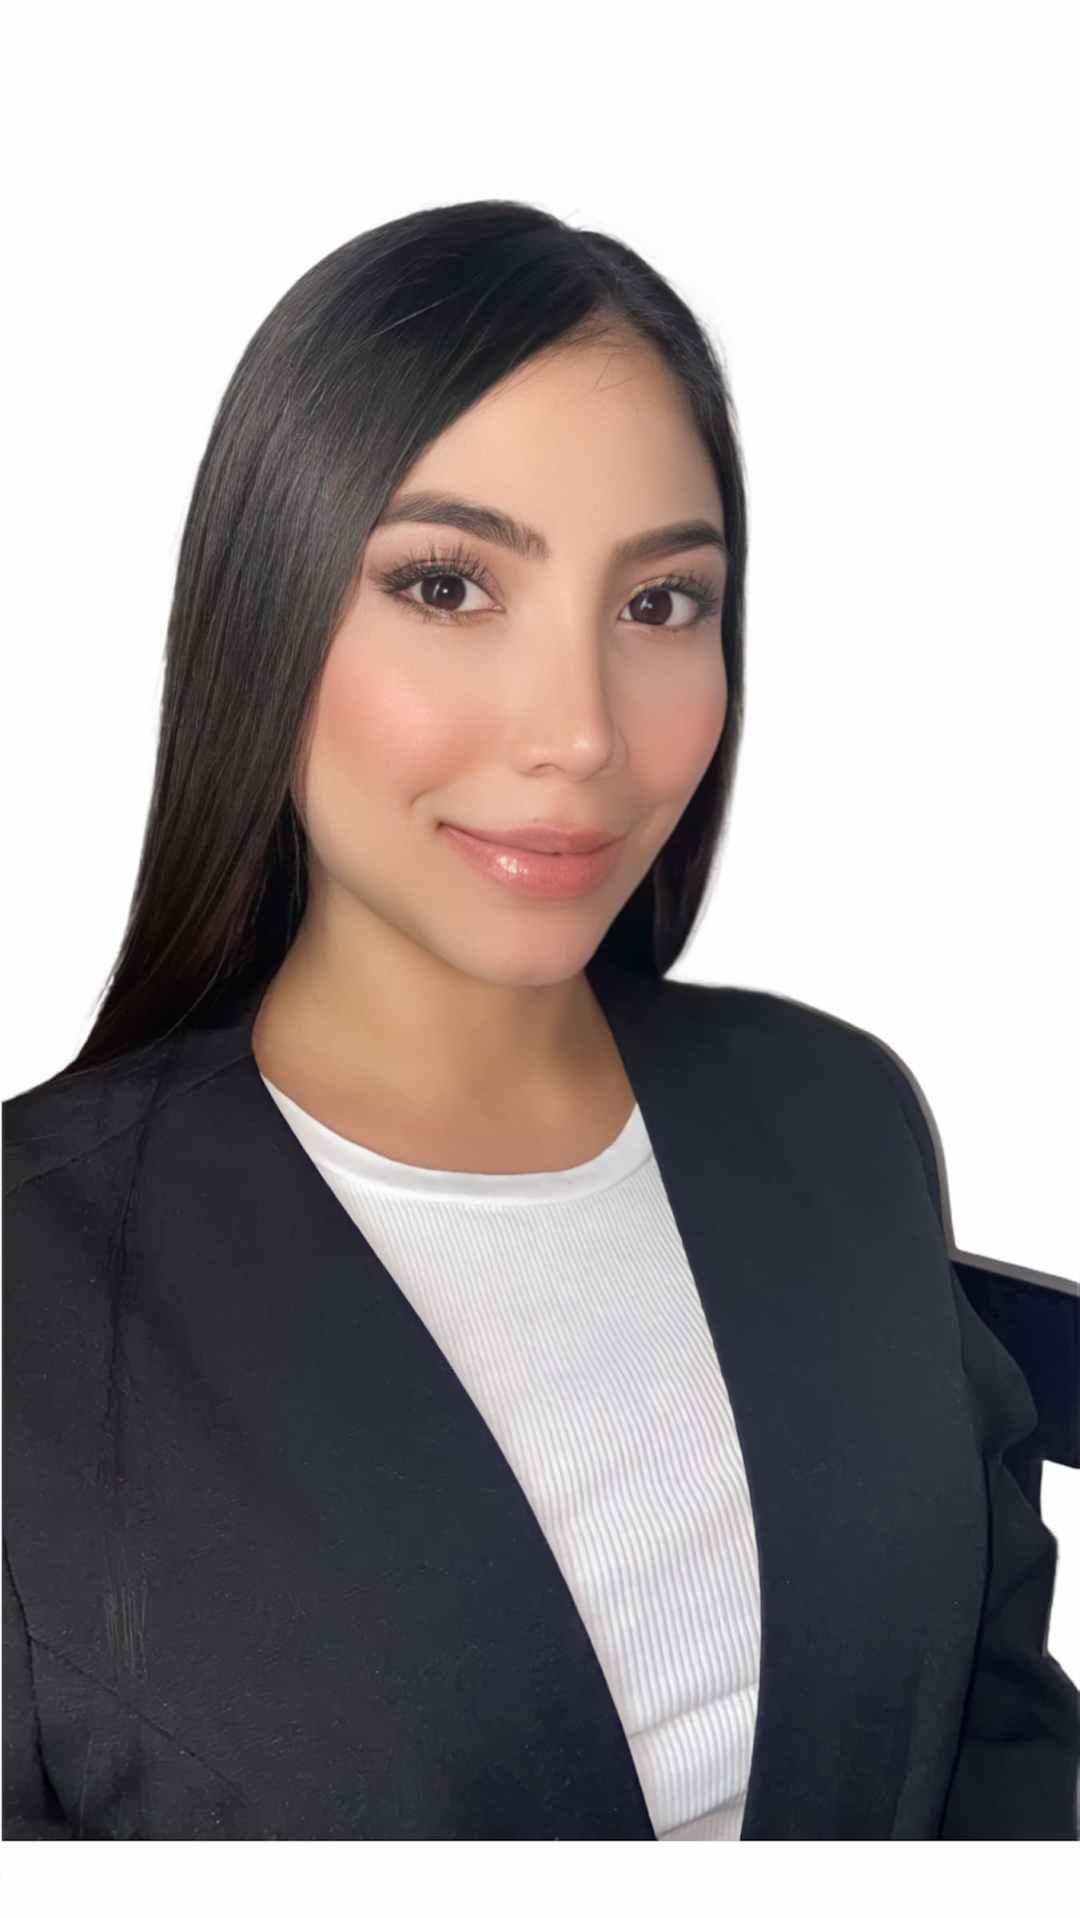 Manuela Cruz Diaz